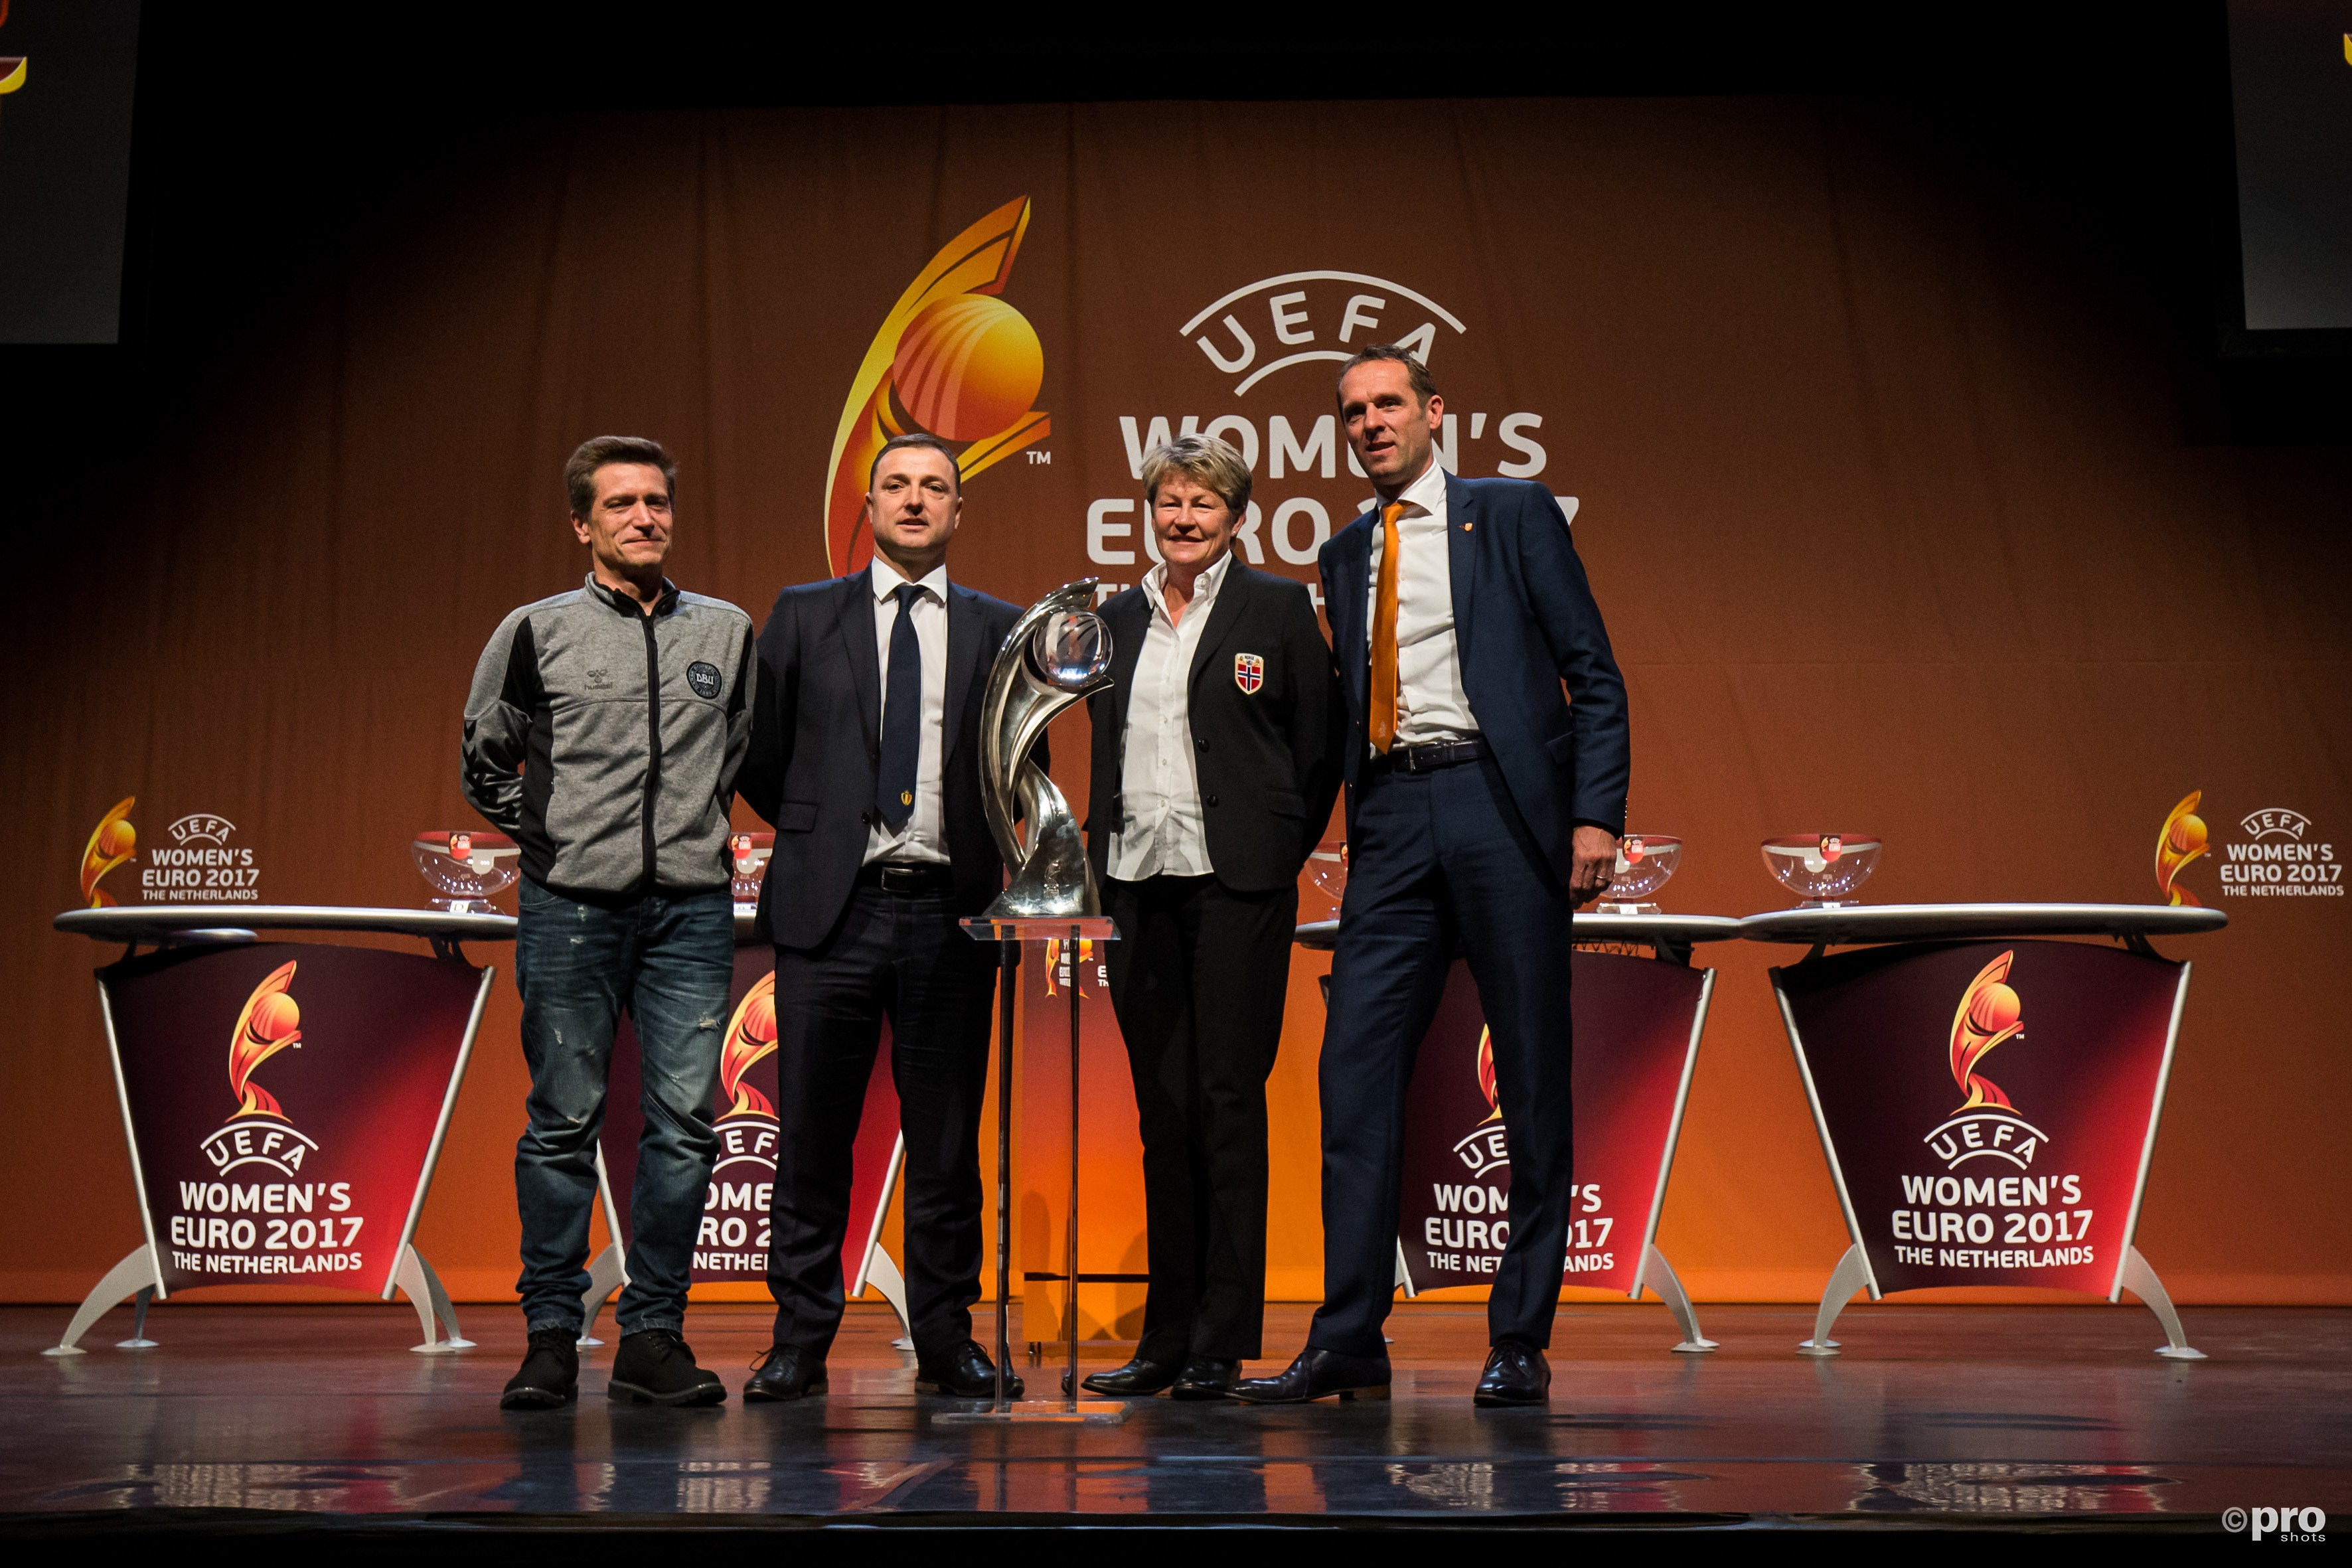 Groep A L-R Nils Nielsen (Denemarken) Ives Serneels (Belgie) coach (Noorwegen) Arjan van der Laan (Nederland). (PRO SHOTS/Erwin Spek